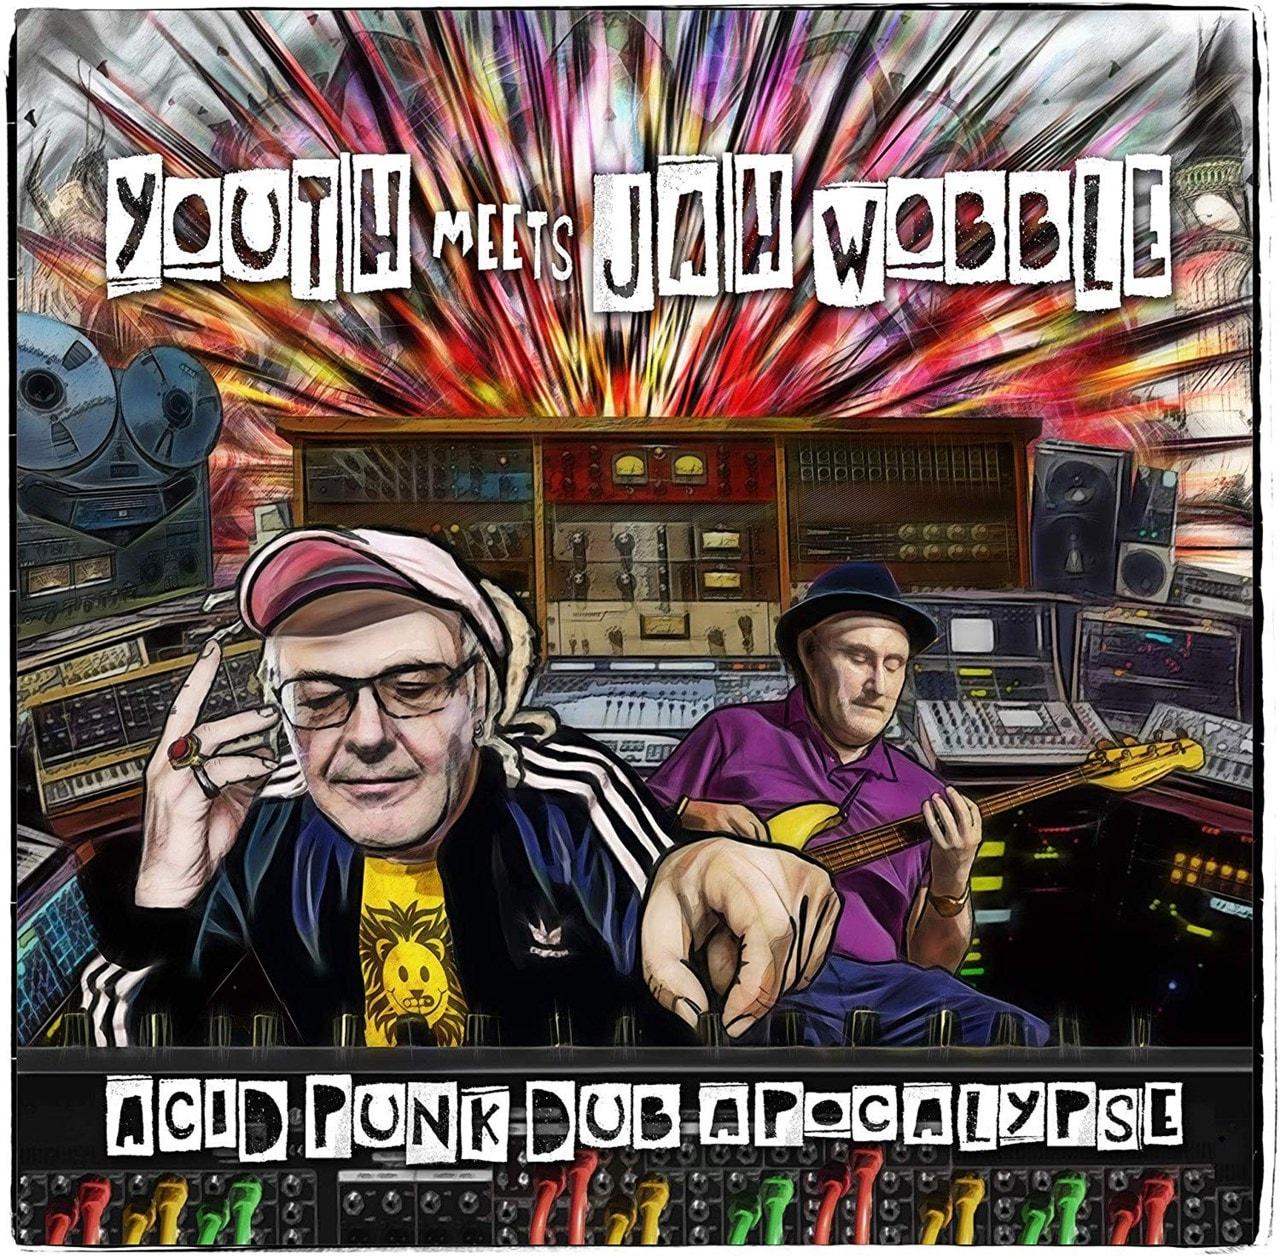 Acid Punk Dub Apocalypse - 1